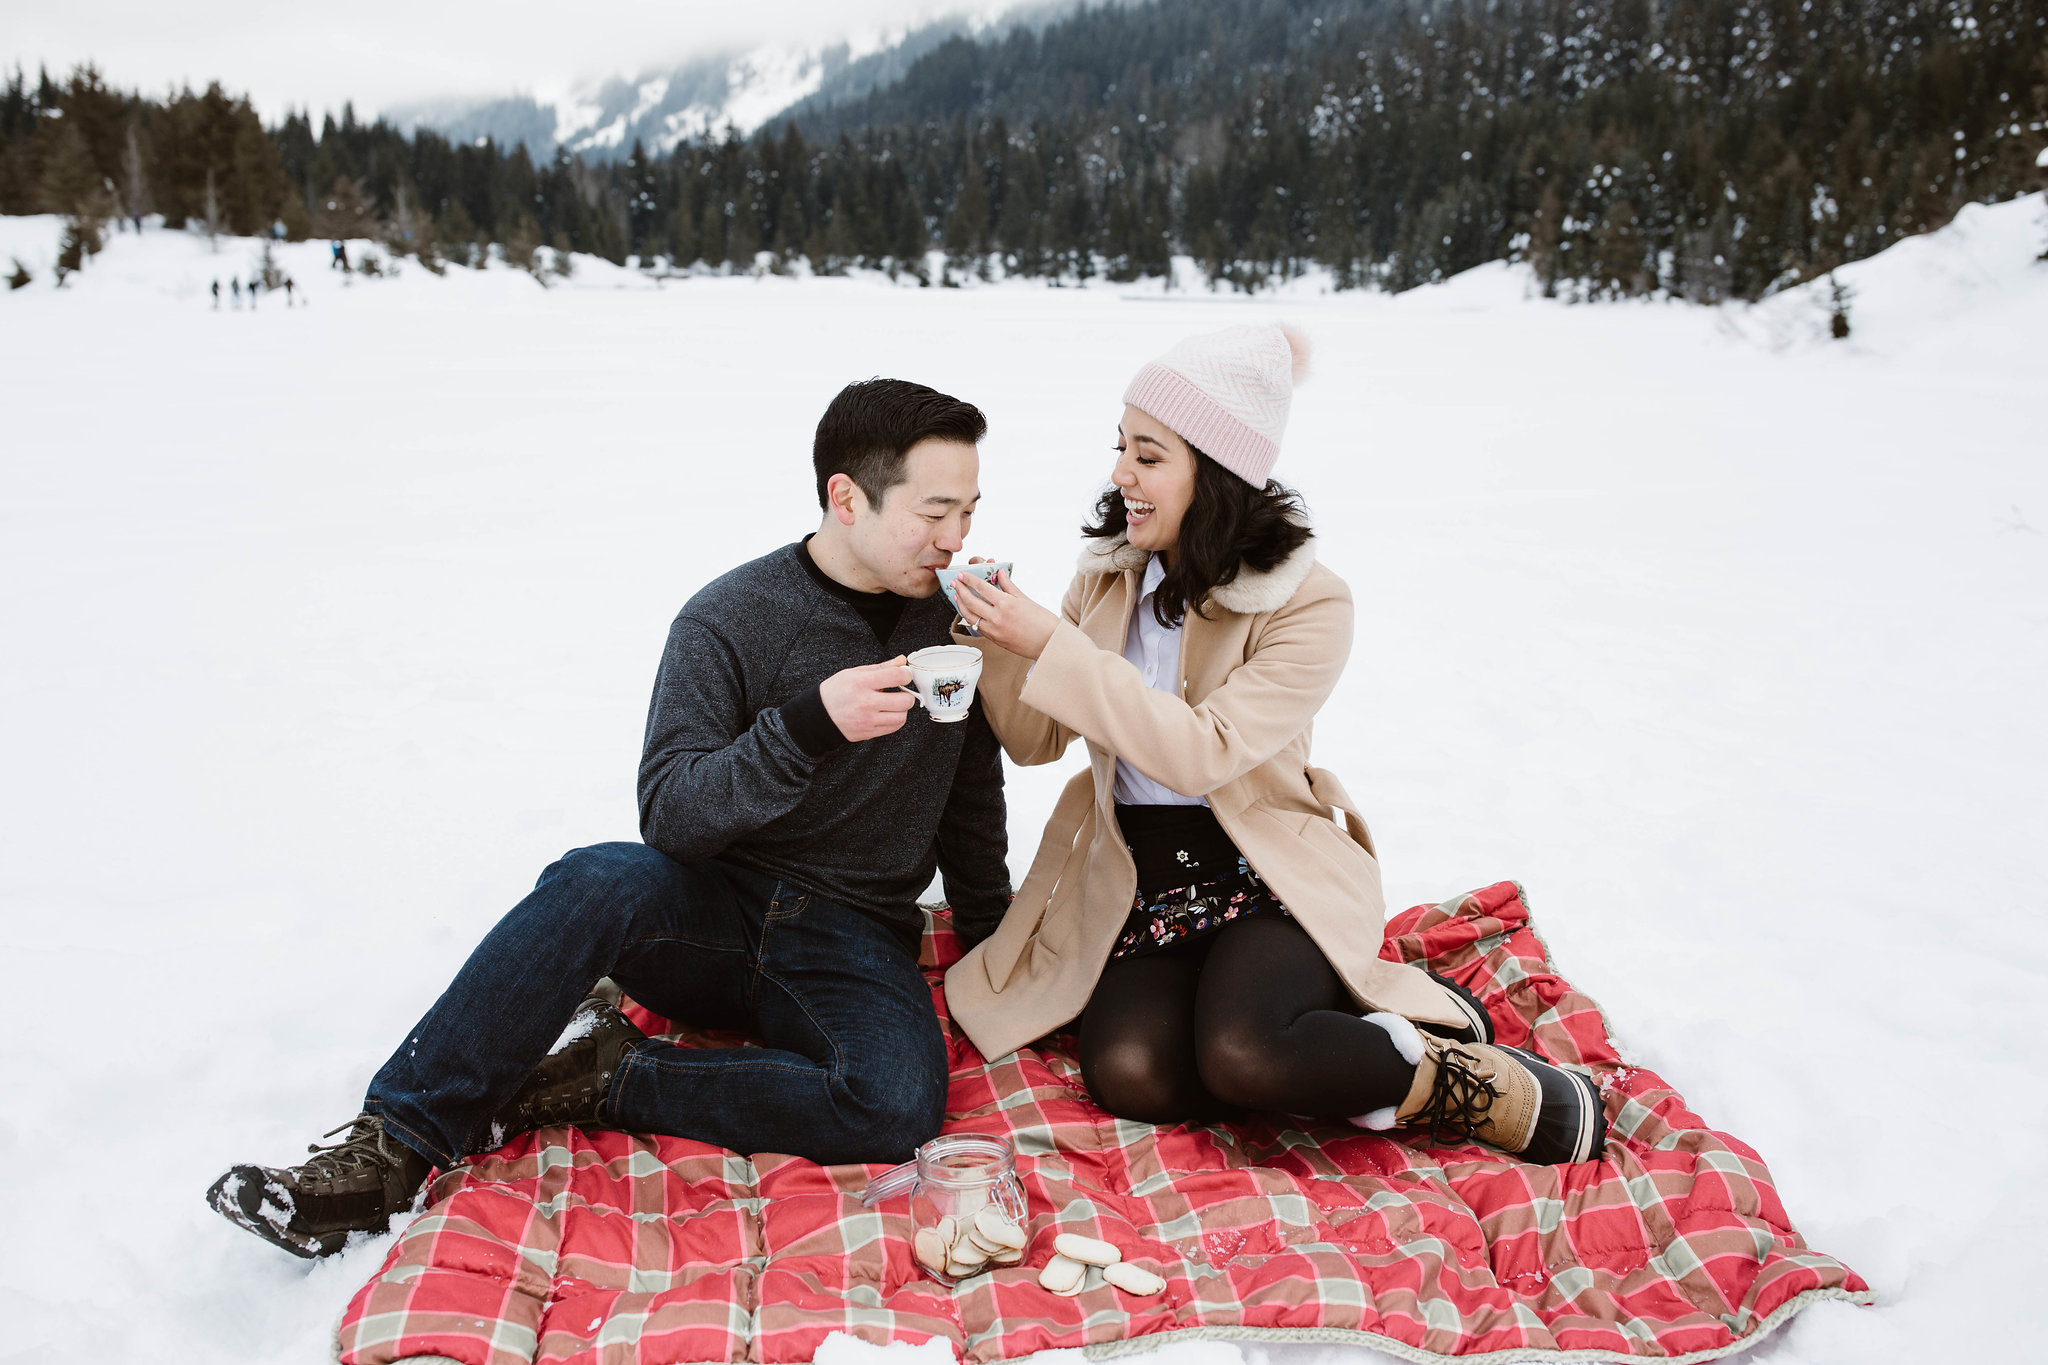 Sarah+Sean_Engagement_Golden+Creek+Pond_Best+Seattle+Wedding+Photographer79.JPG